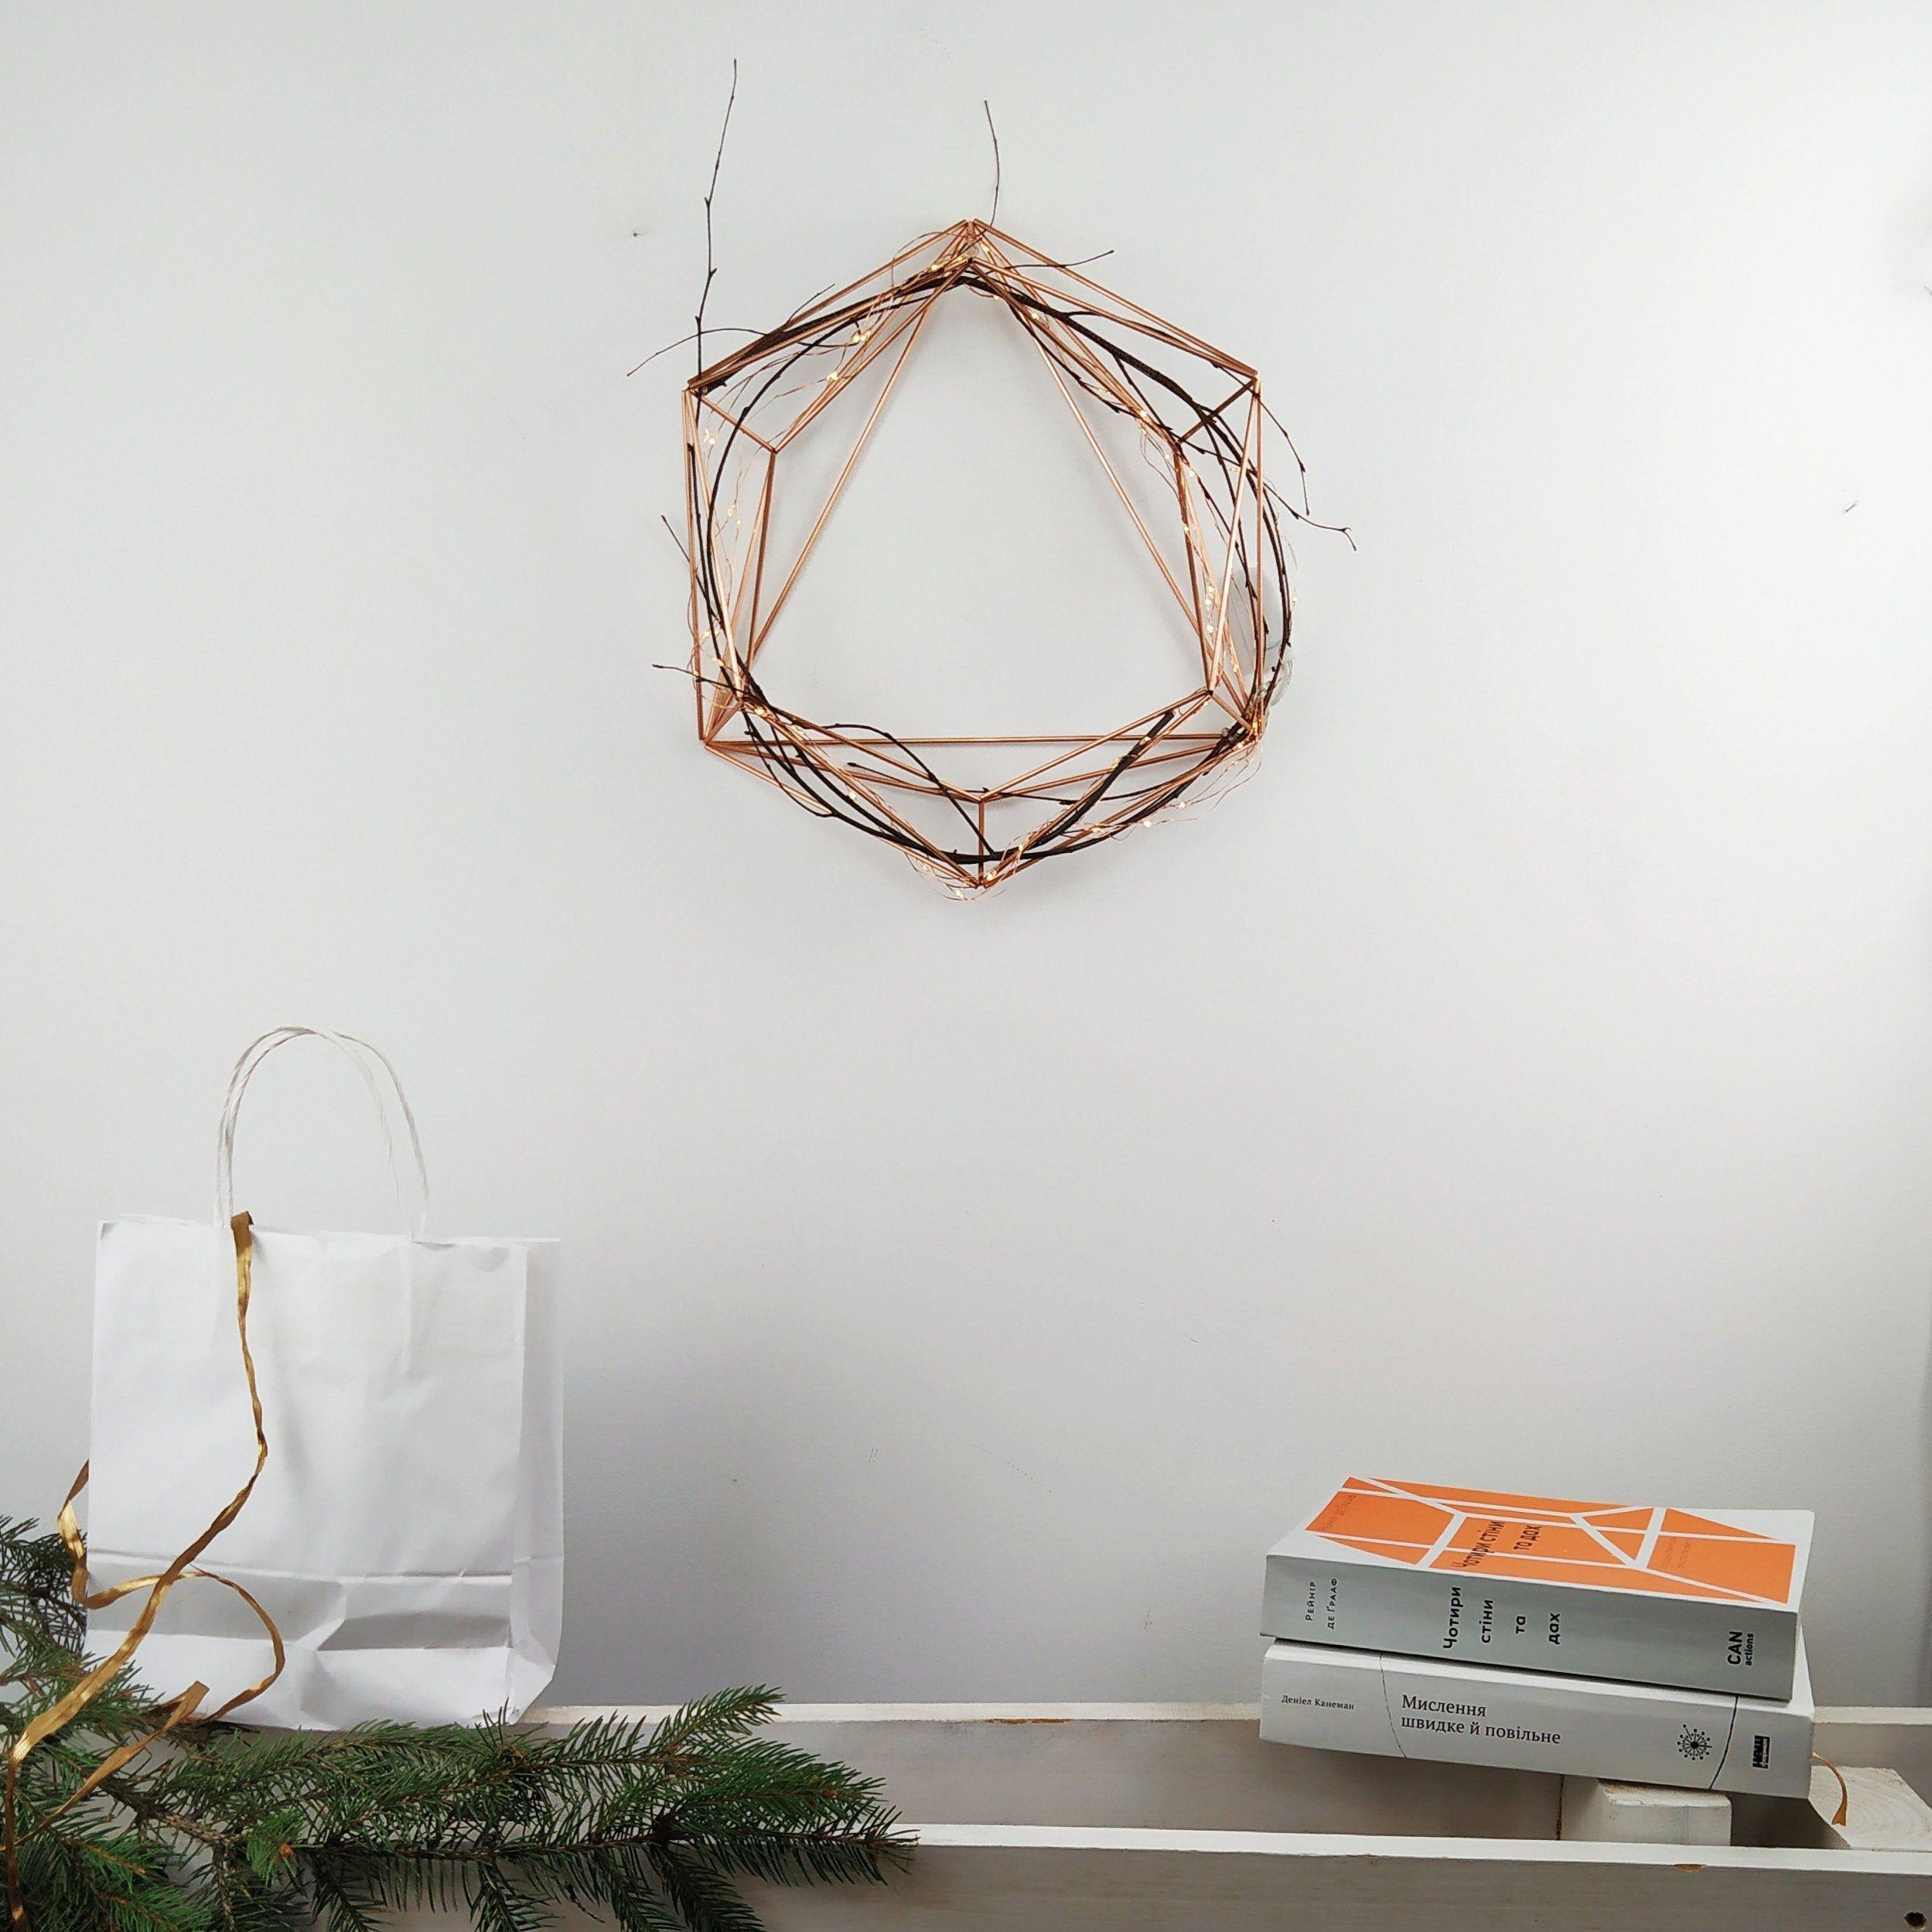 Minimalist Geometric Christmas Wreath Modern Advent Wreath Artdeco Wall Decor 13 Copper  Minimalist Geometric Christmas Wreath Modern Advent Wreath Artdeco Wall Decor 13...